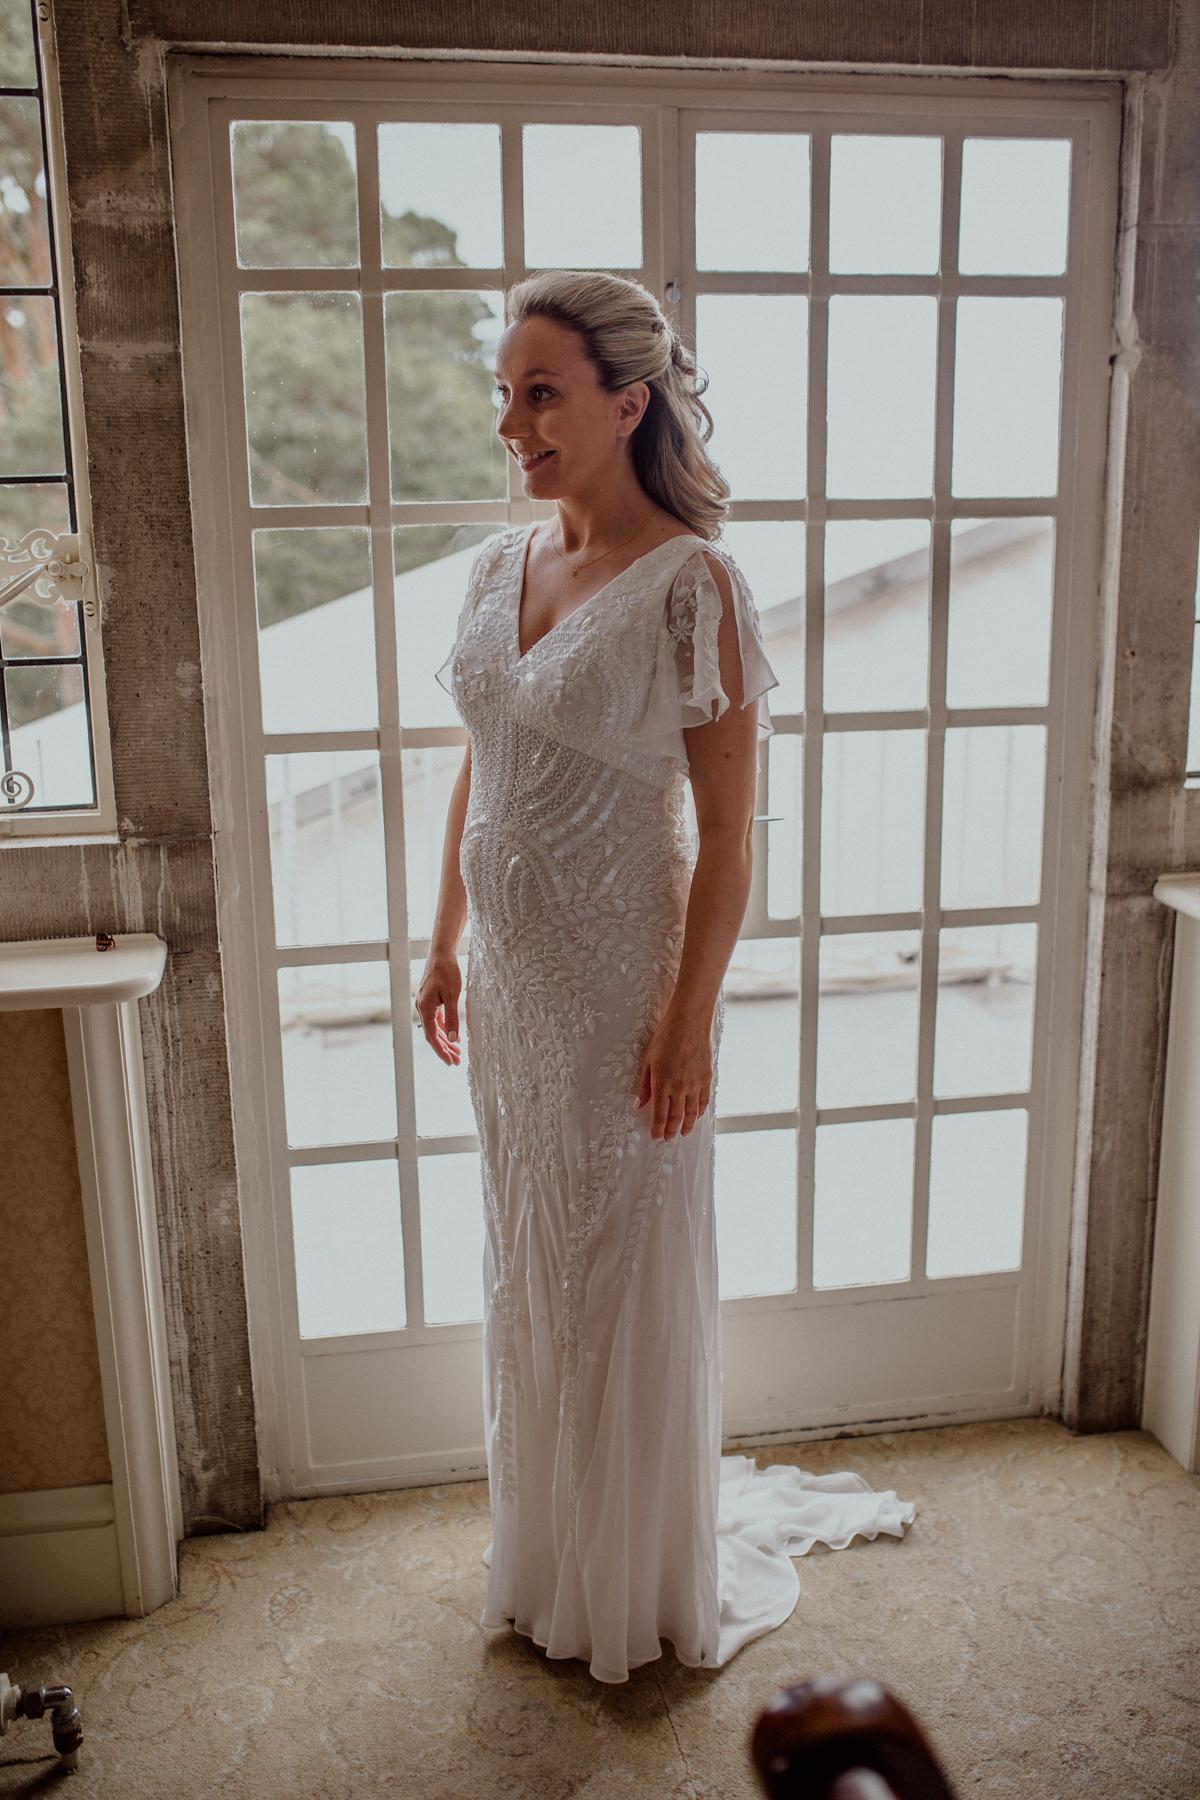 2816877abf Eliza Jane Howell bride - An Eliza Jane Howell Beaded Dress And Family  Heirloom Veil ...